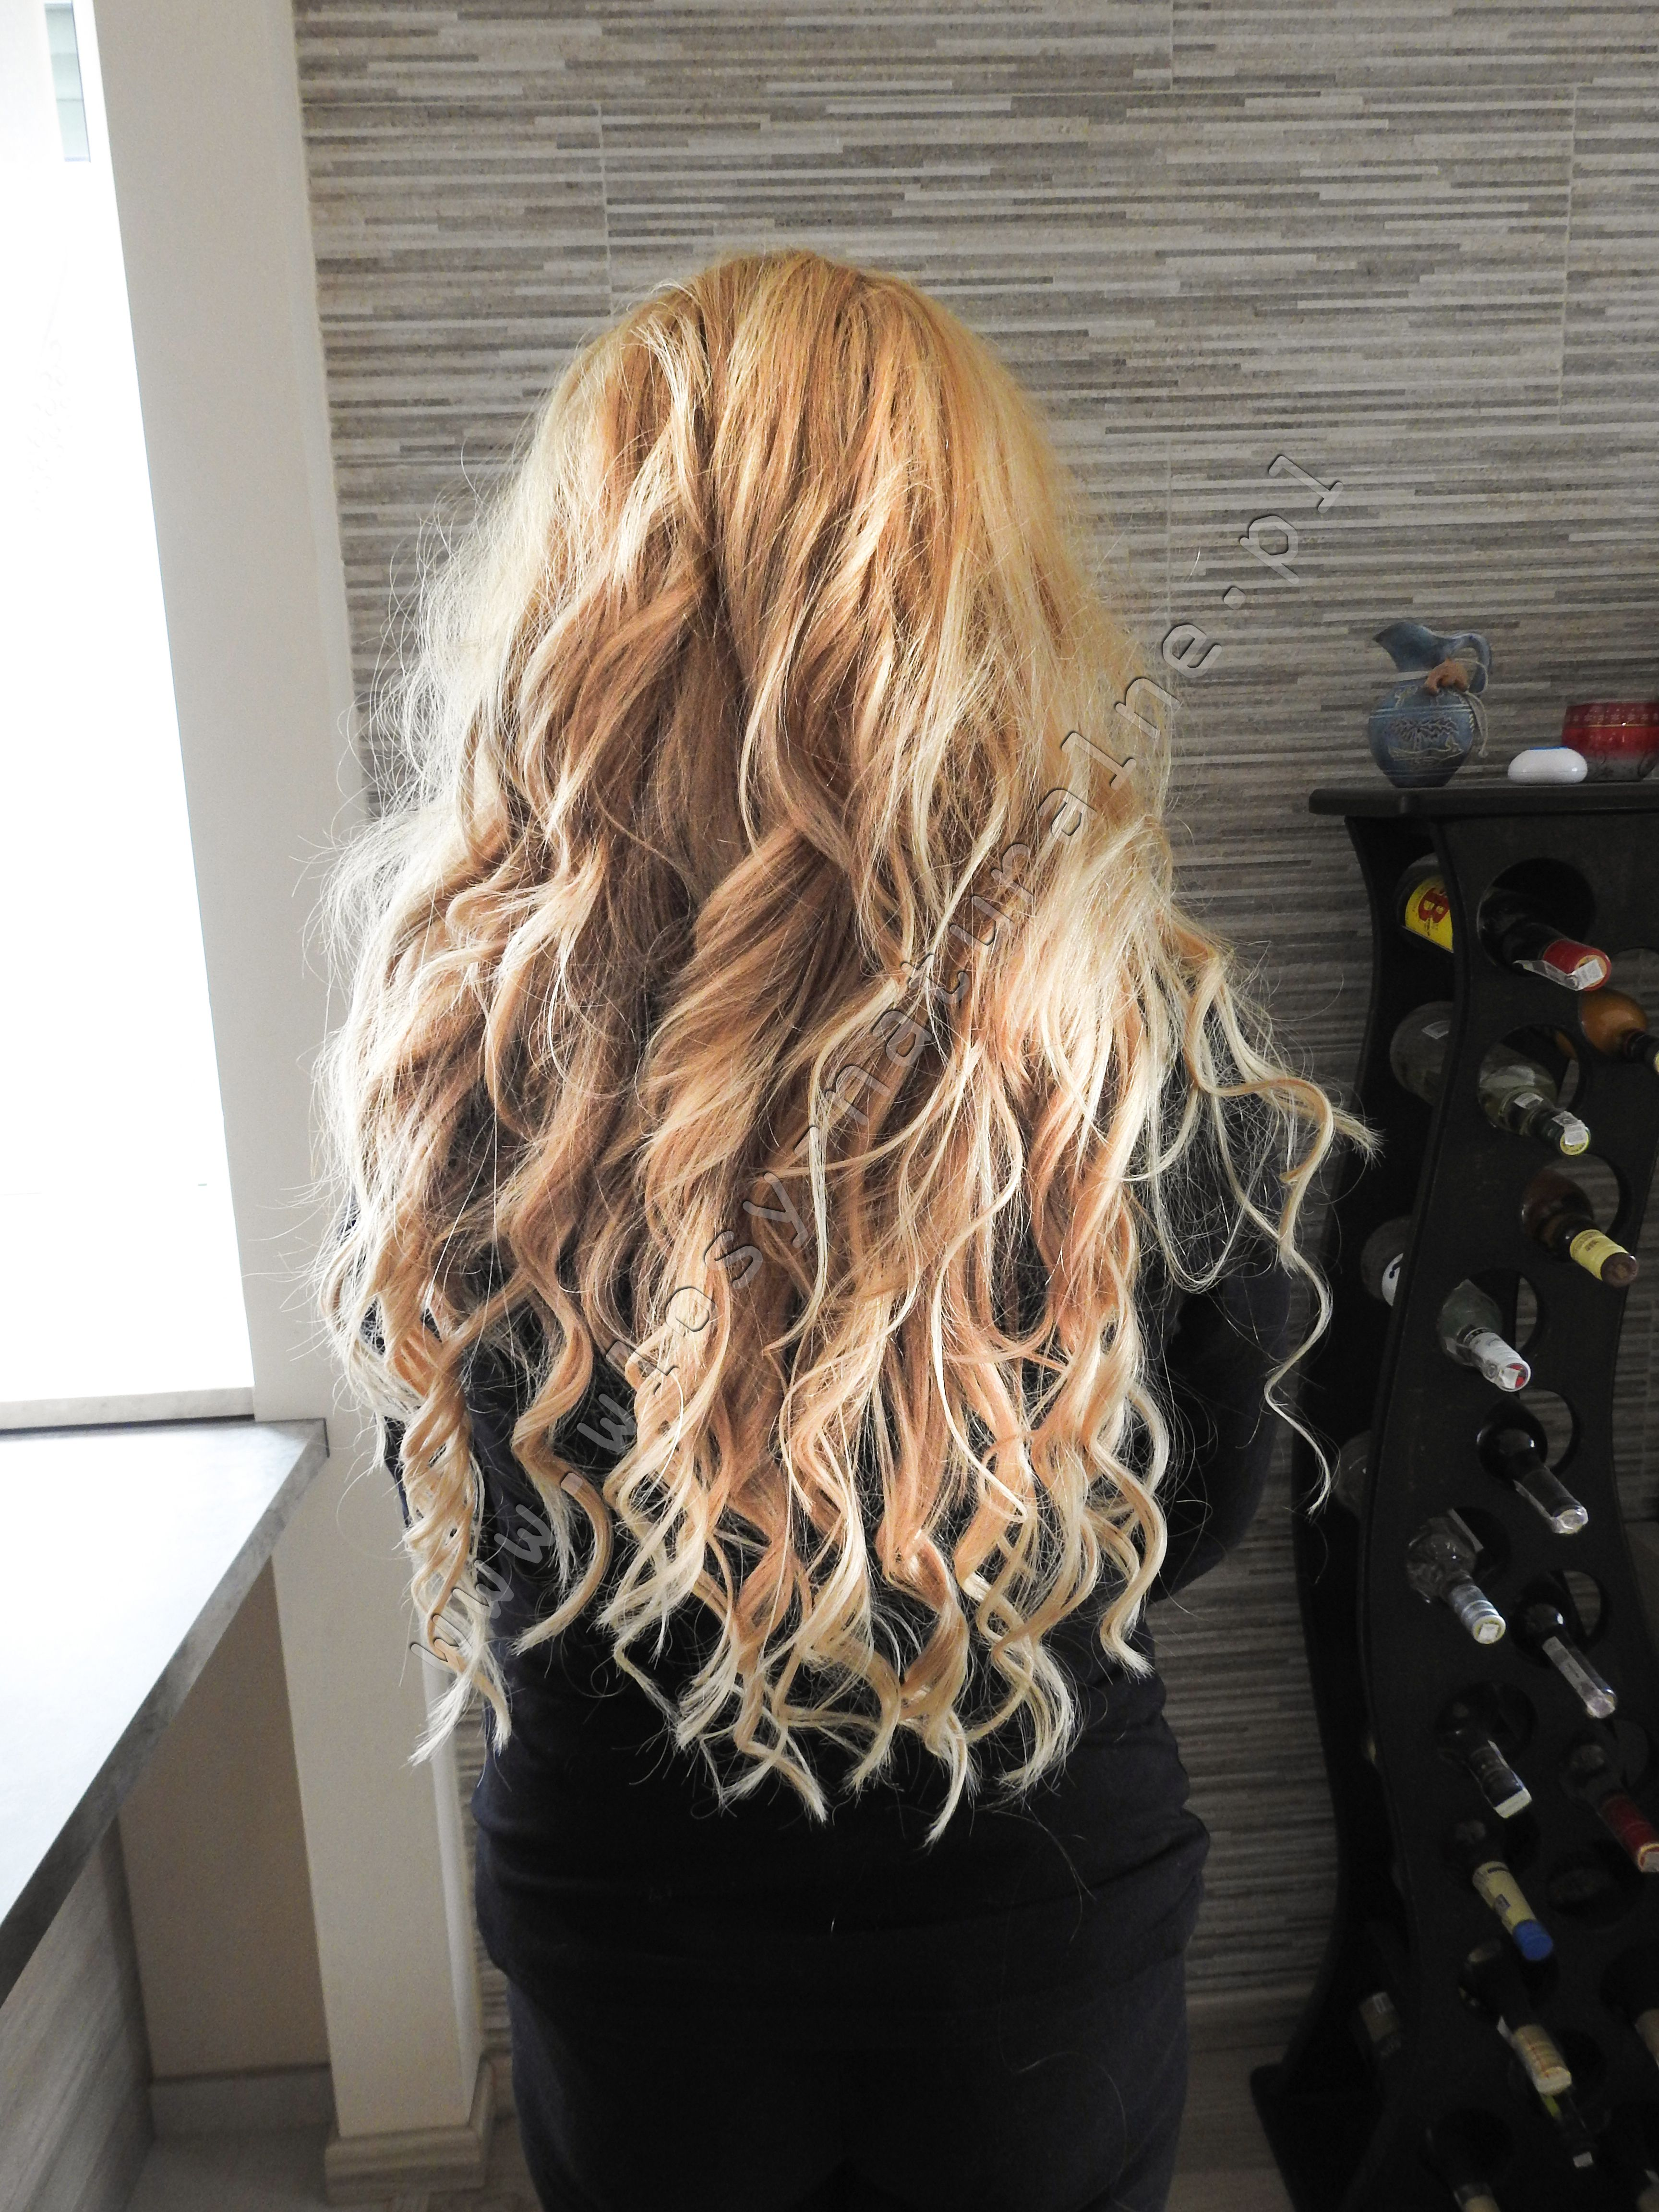 Hair Extensions Blonde Long Hair Curly Hair Wlosy Naturalne